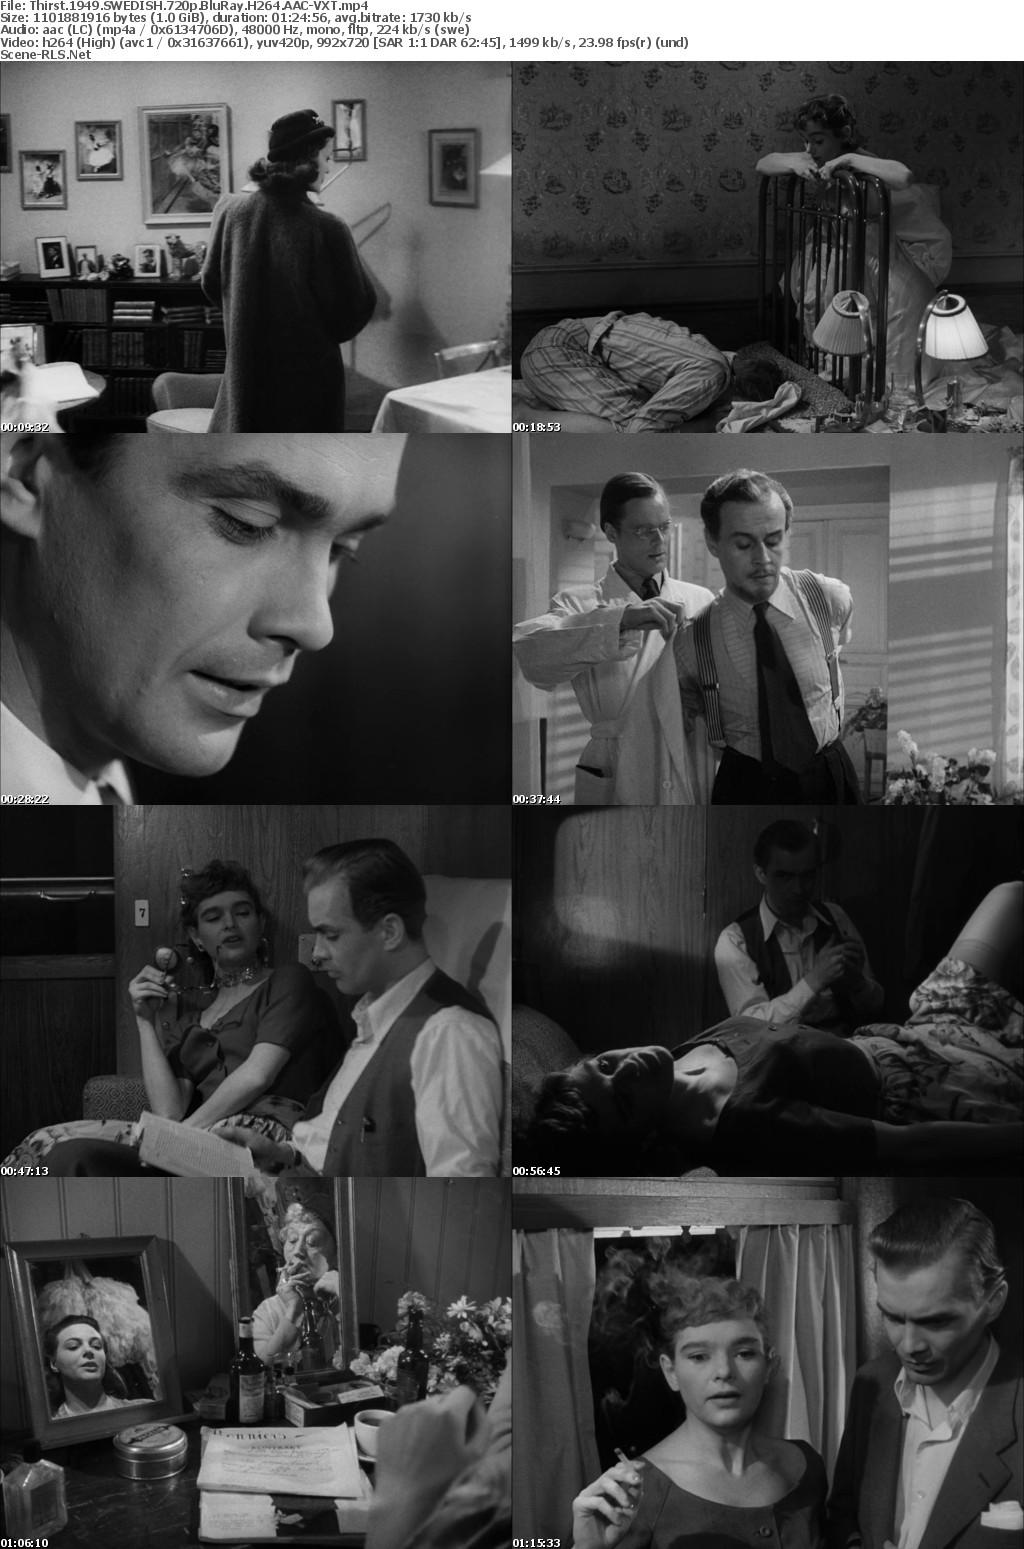 Thirst 1949 SWEDISH 720p BluRay H264 AAC-VXT - Scene Release